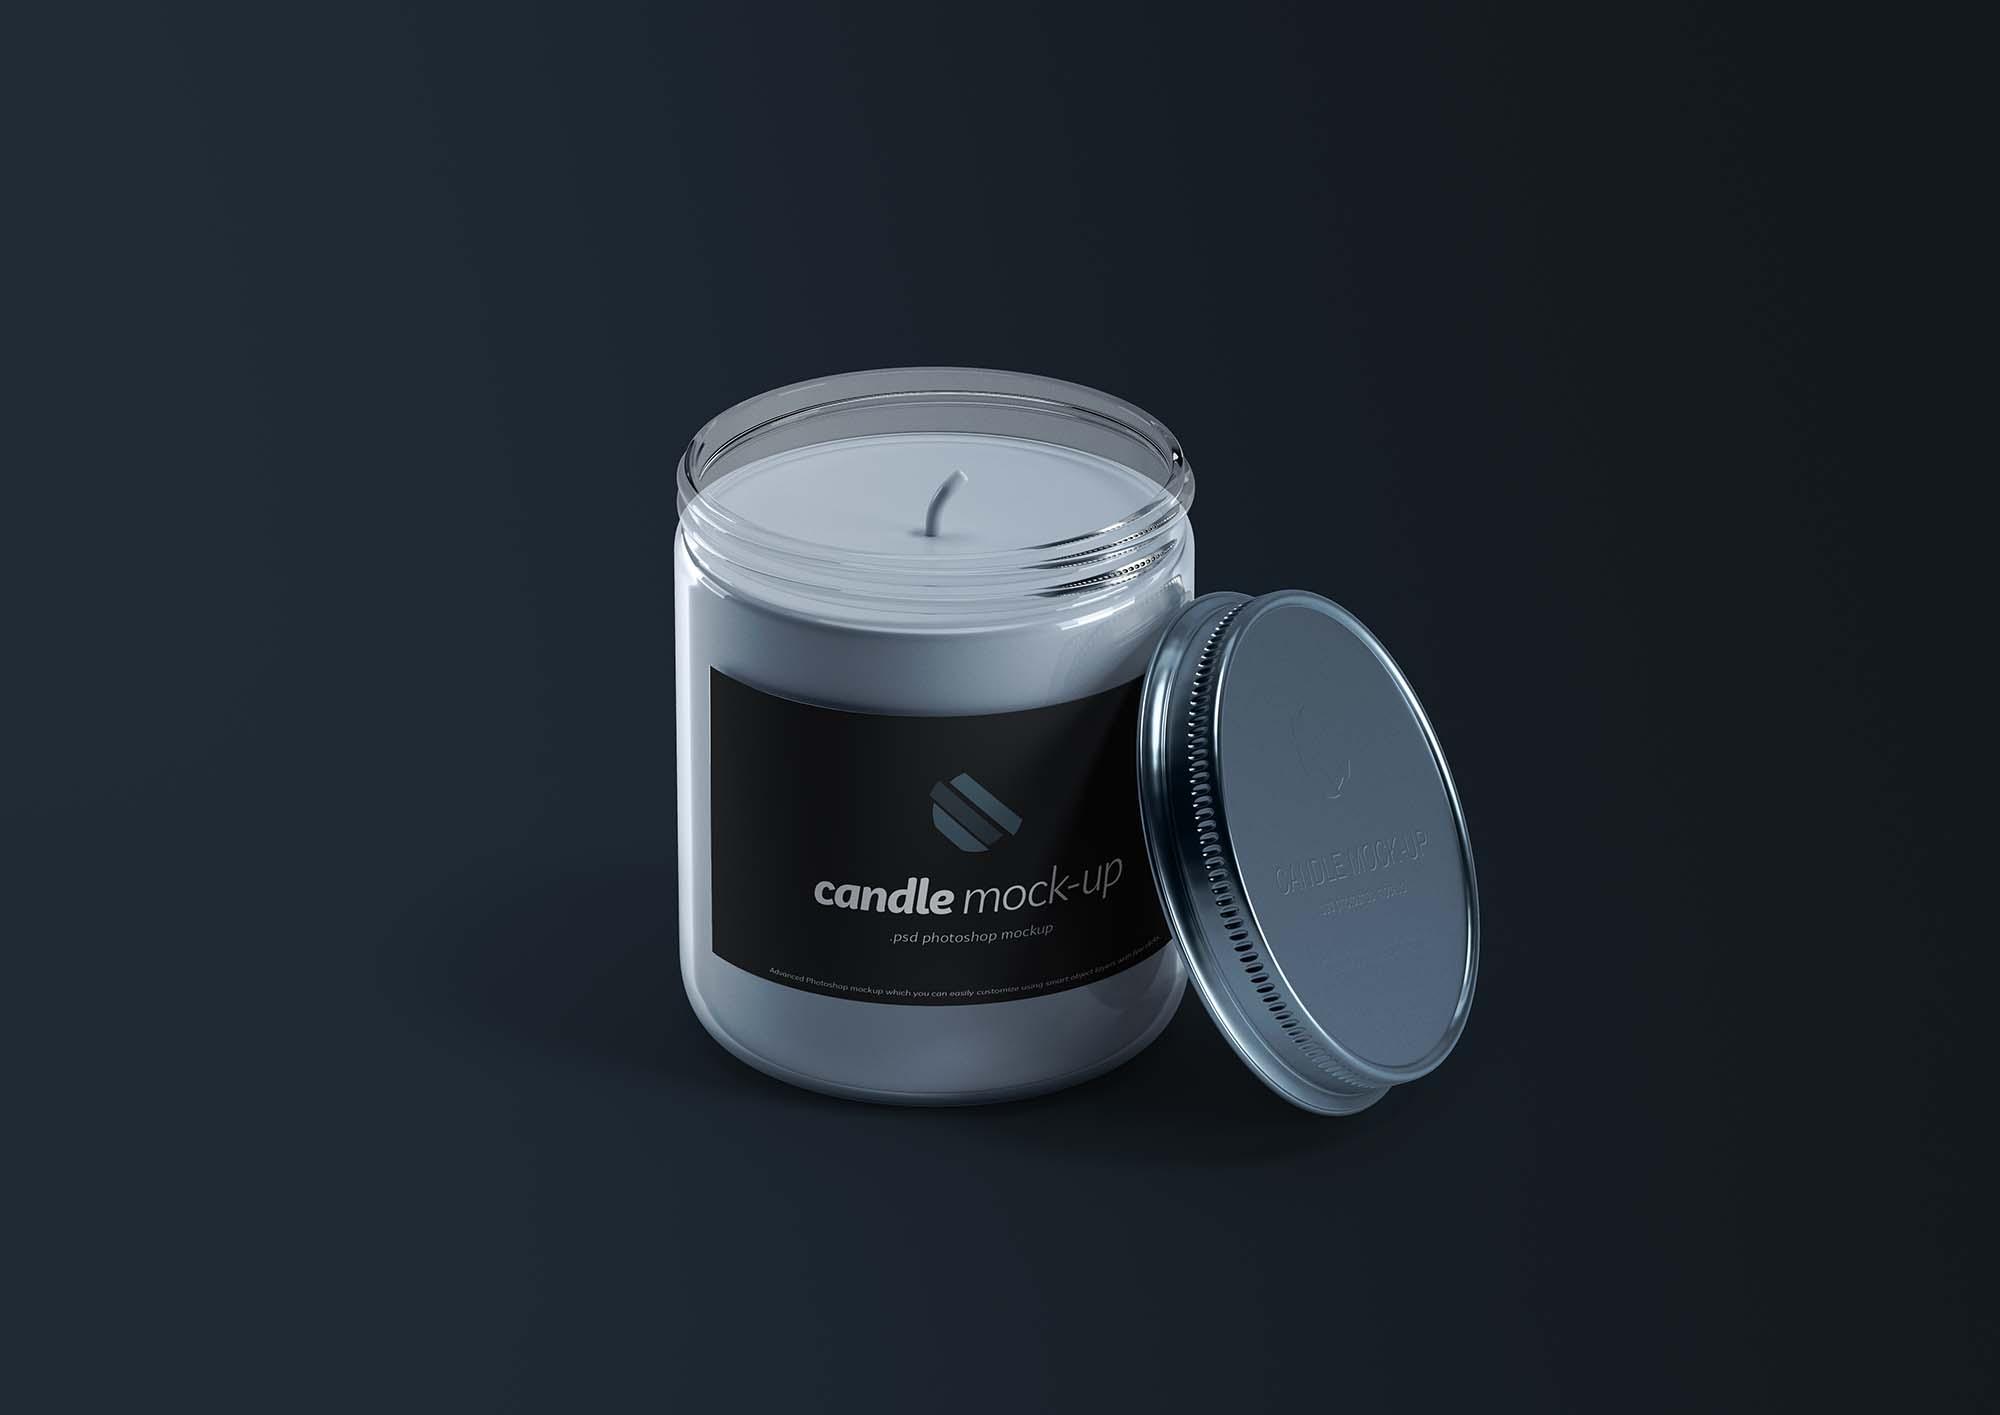 Branded Candle Mockup 2